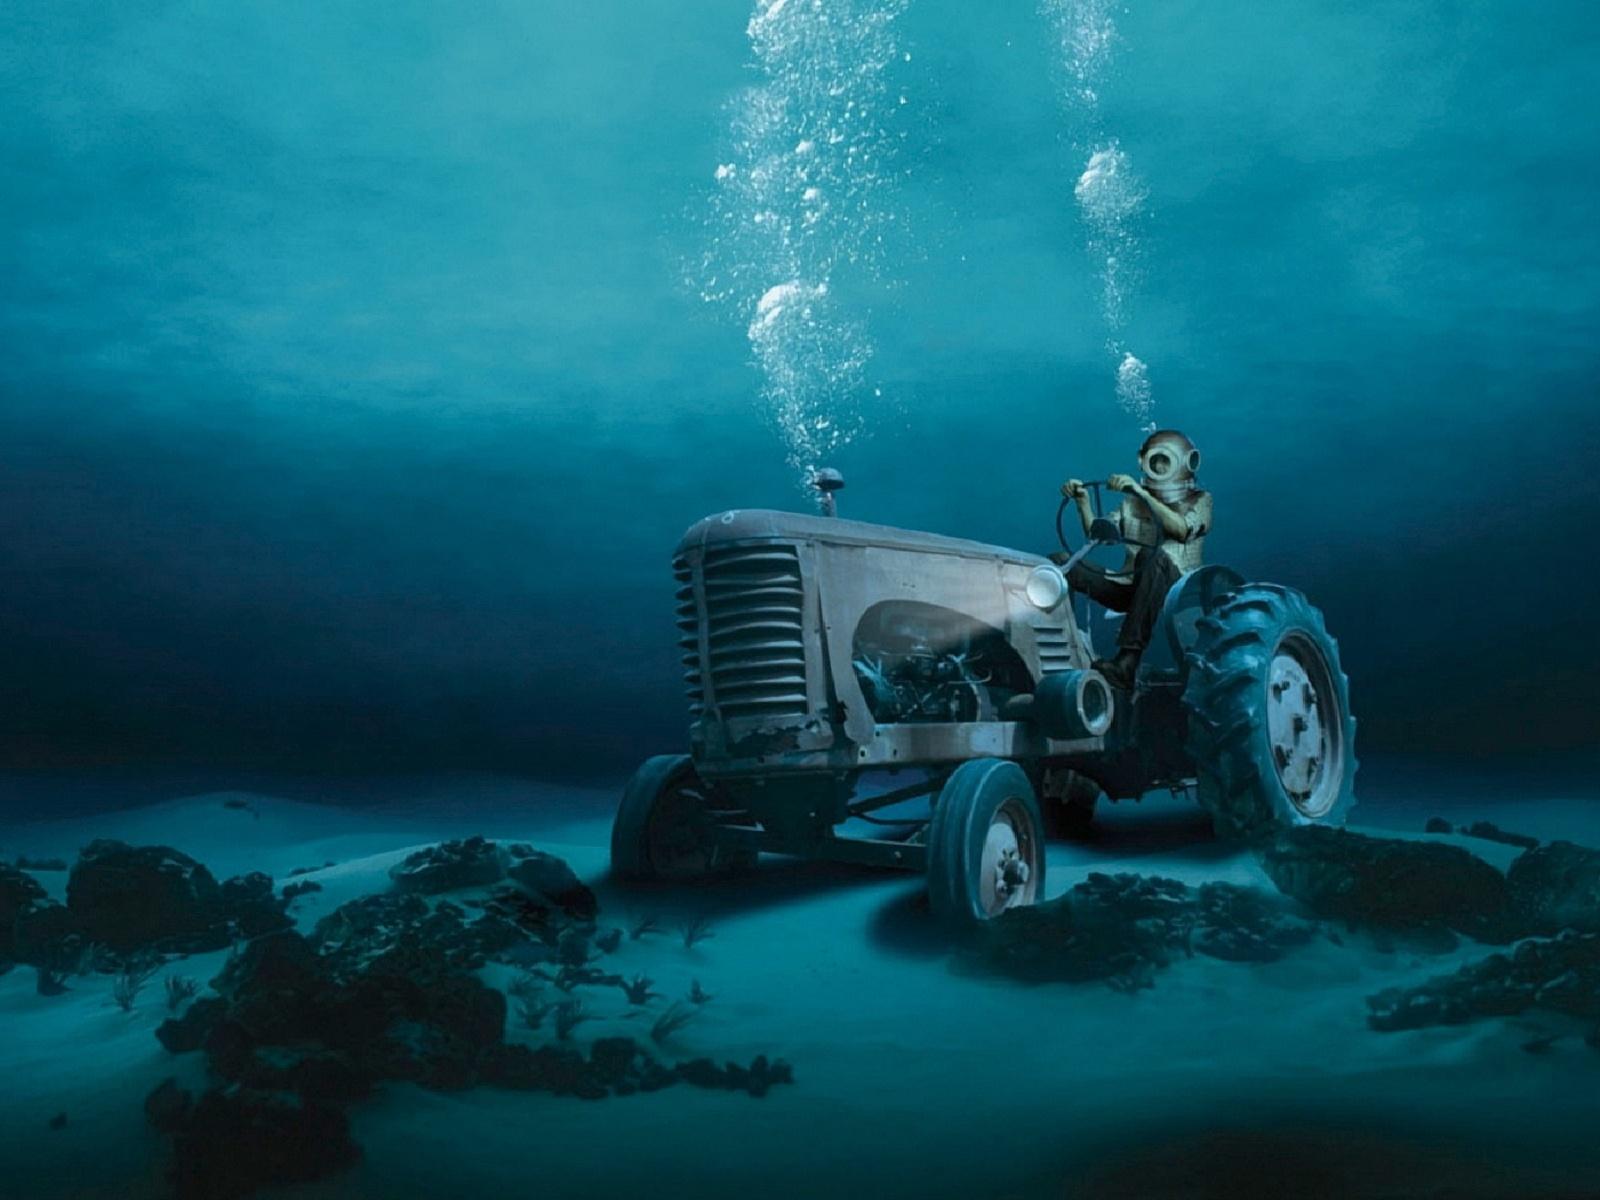 4k divers wallpapers high quality download free for Sfondi desktop 4k